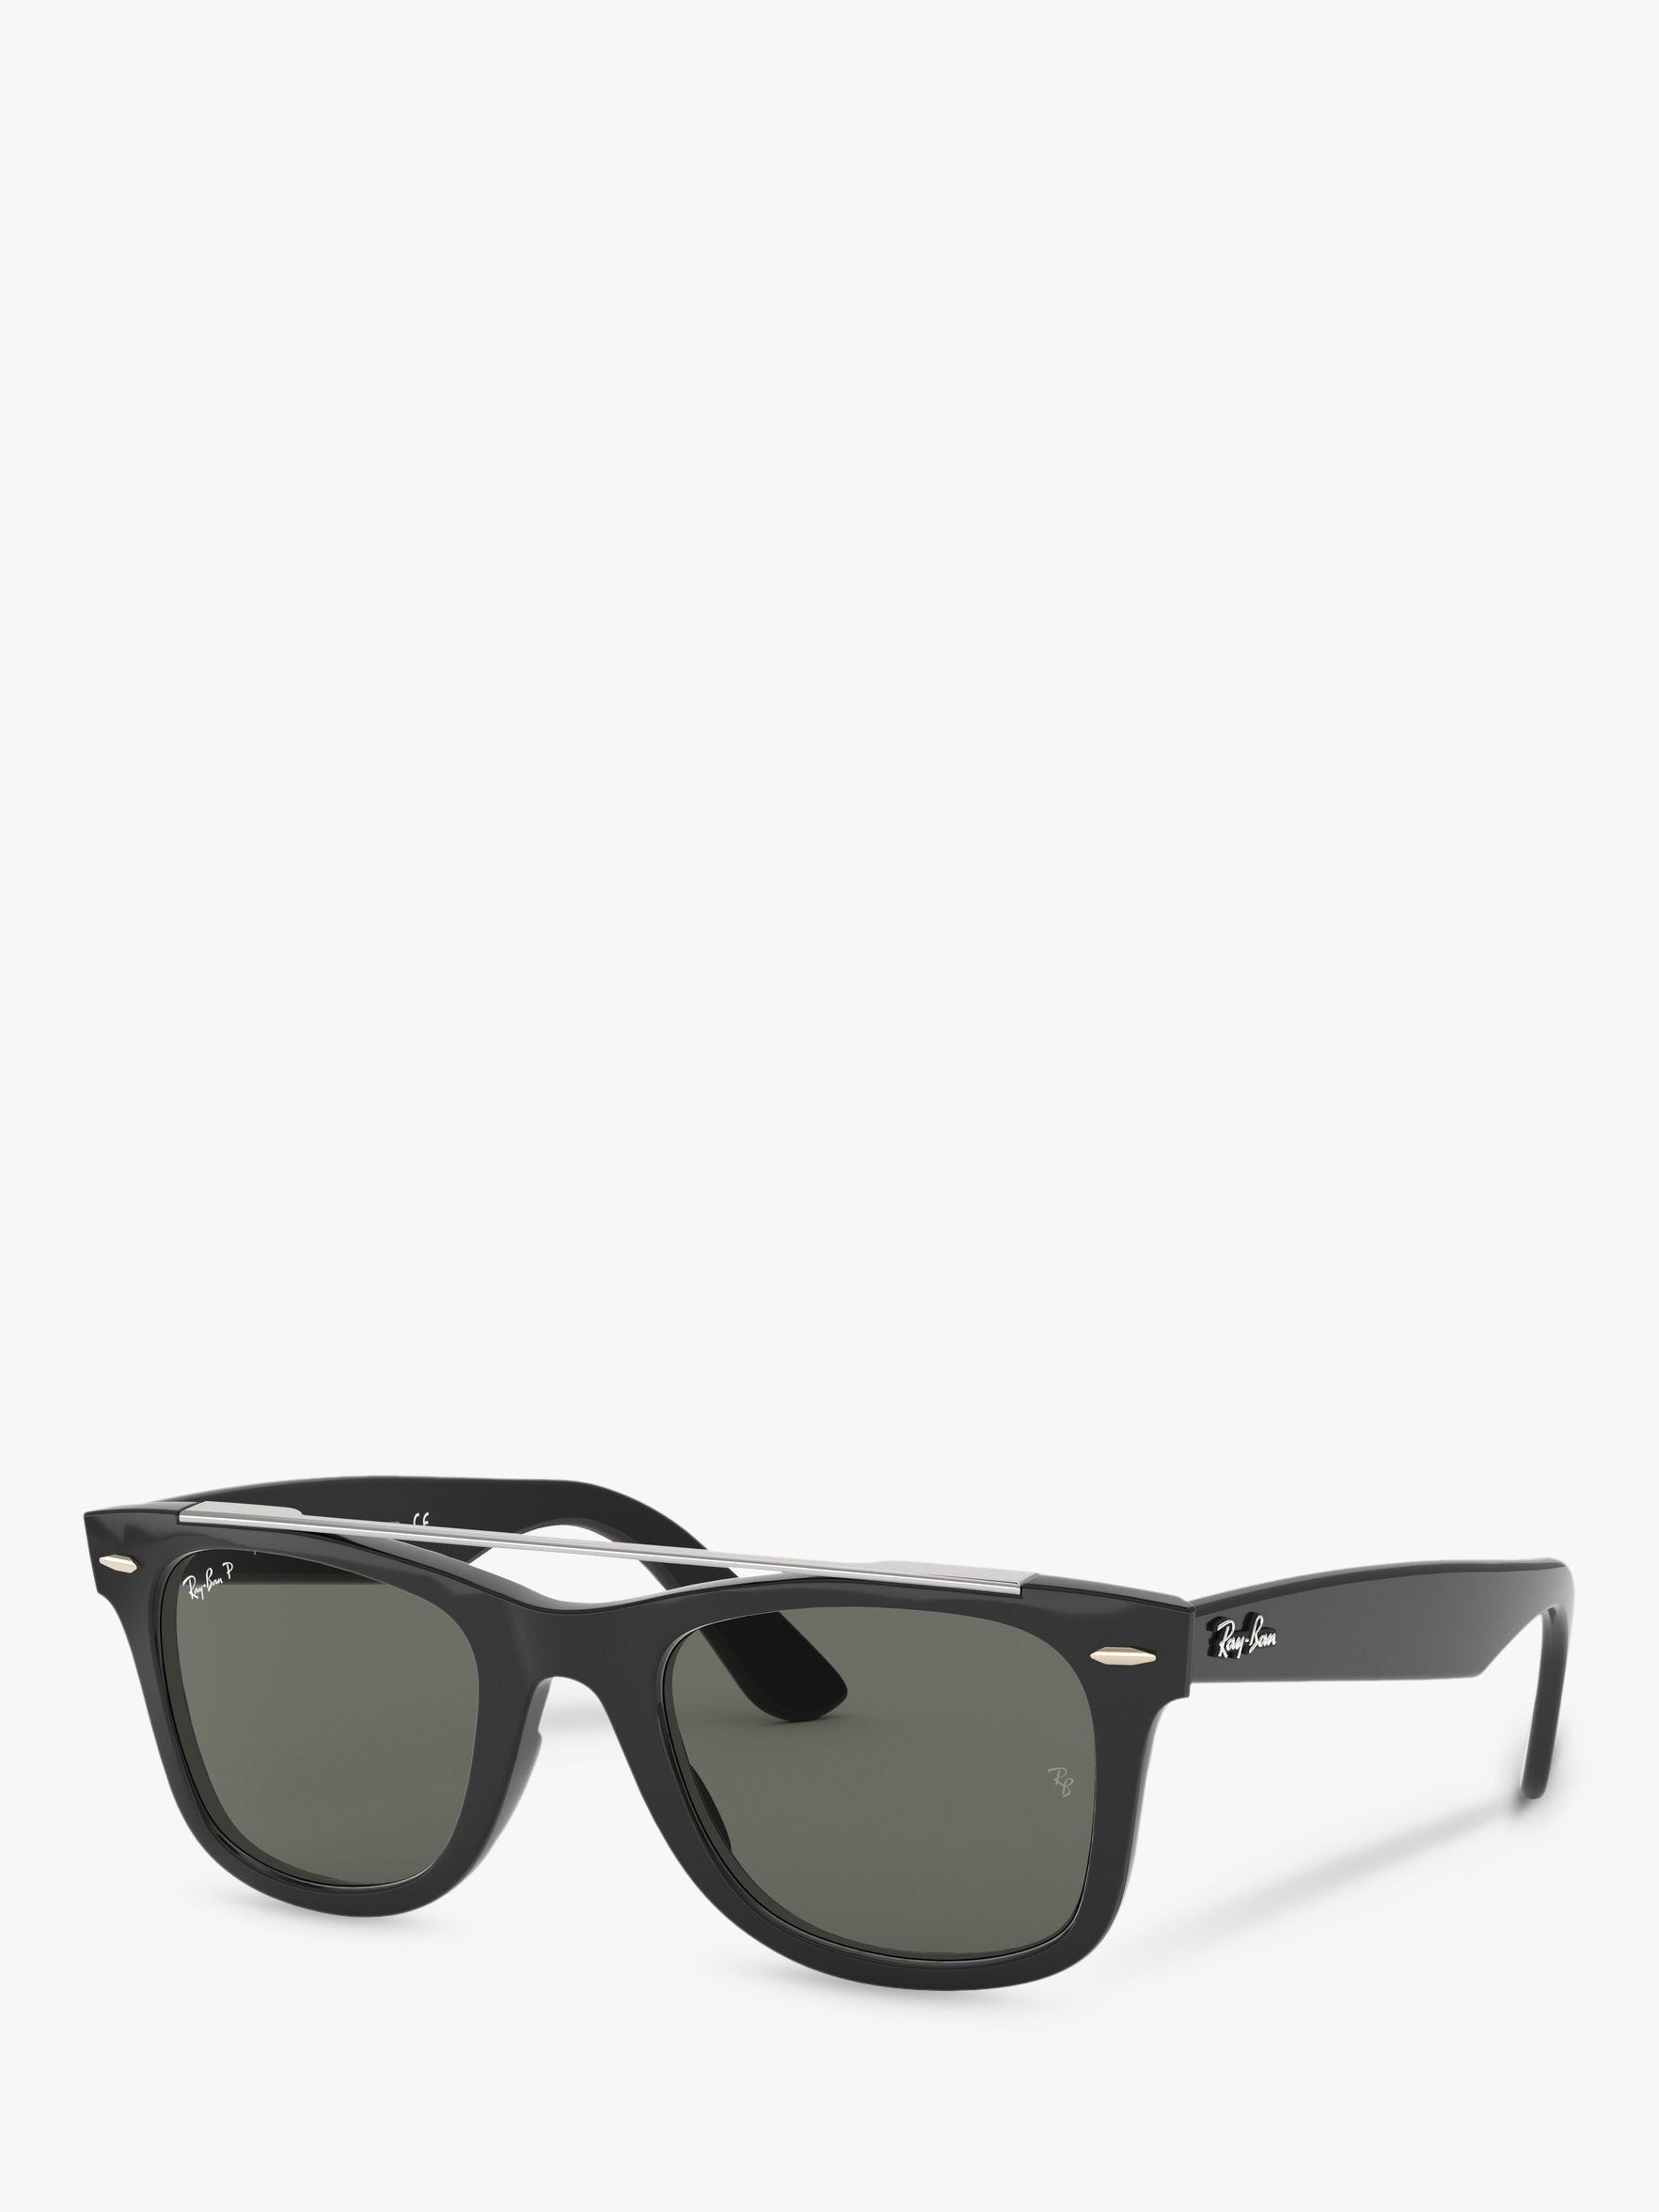 868068b5bd1 Ray-Ban. Black Rb4540 Women s Polarised Wayfarer Double Bridge Sunglasses